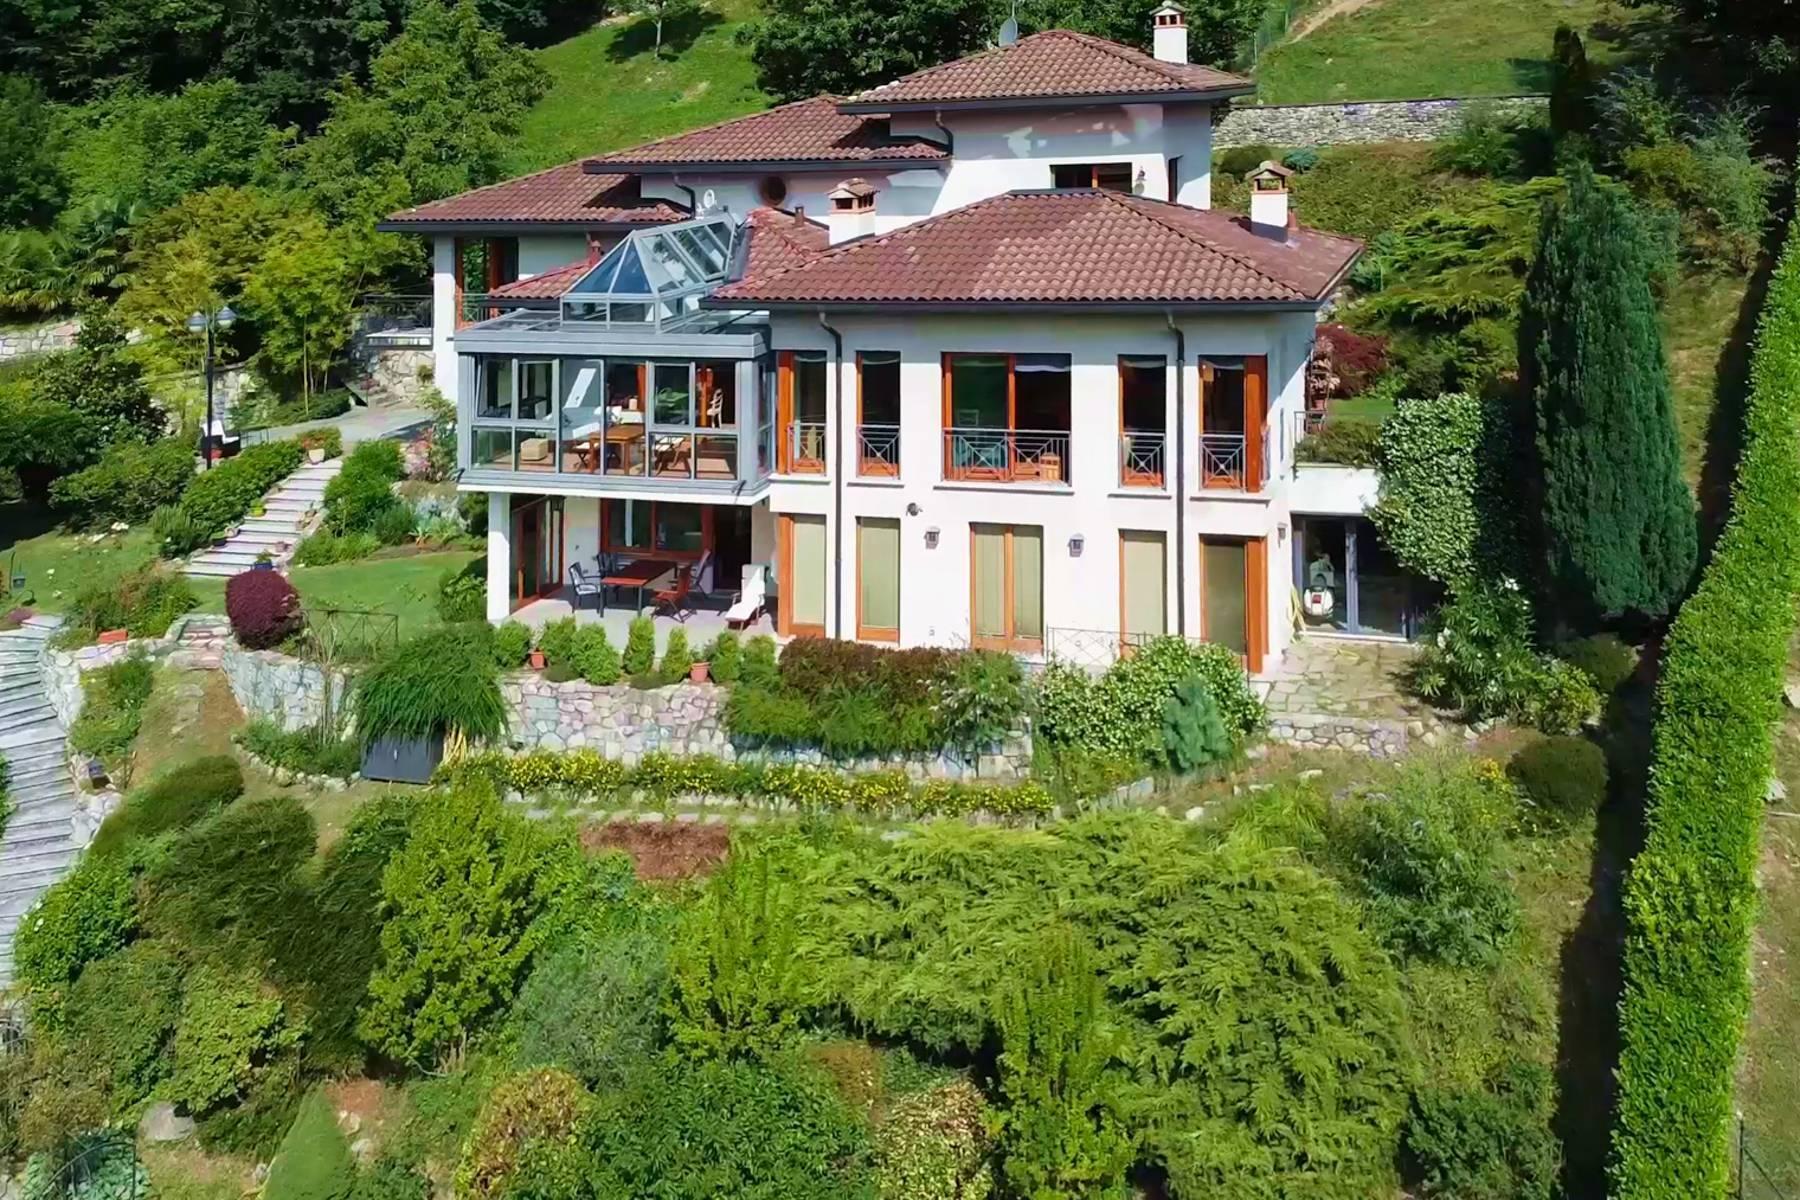 Splendida villa moderna sulla collina soleggiata sopra Argegno - 1